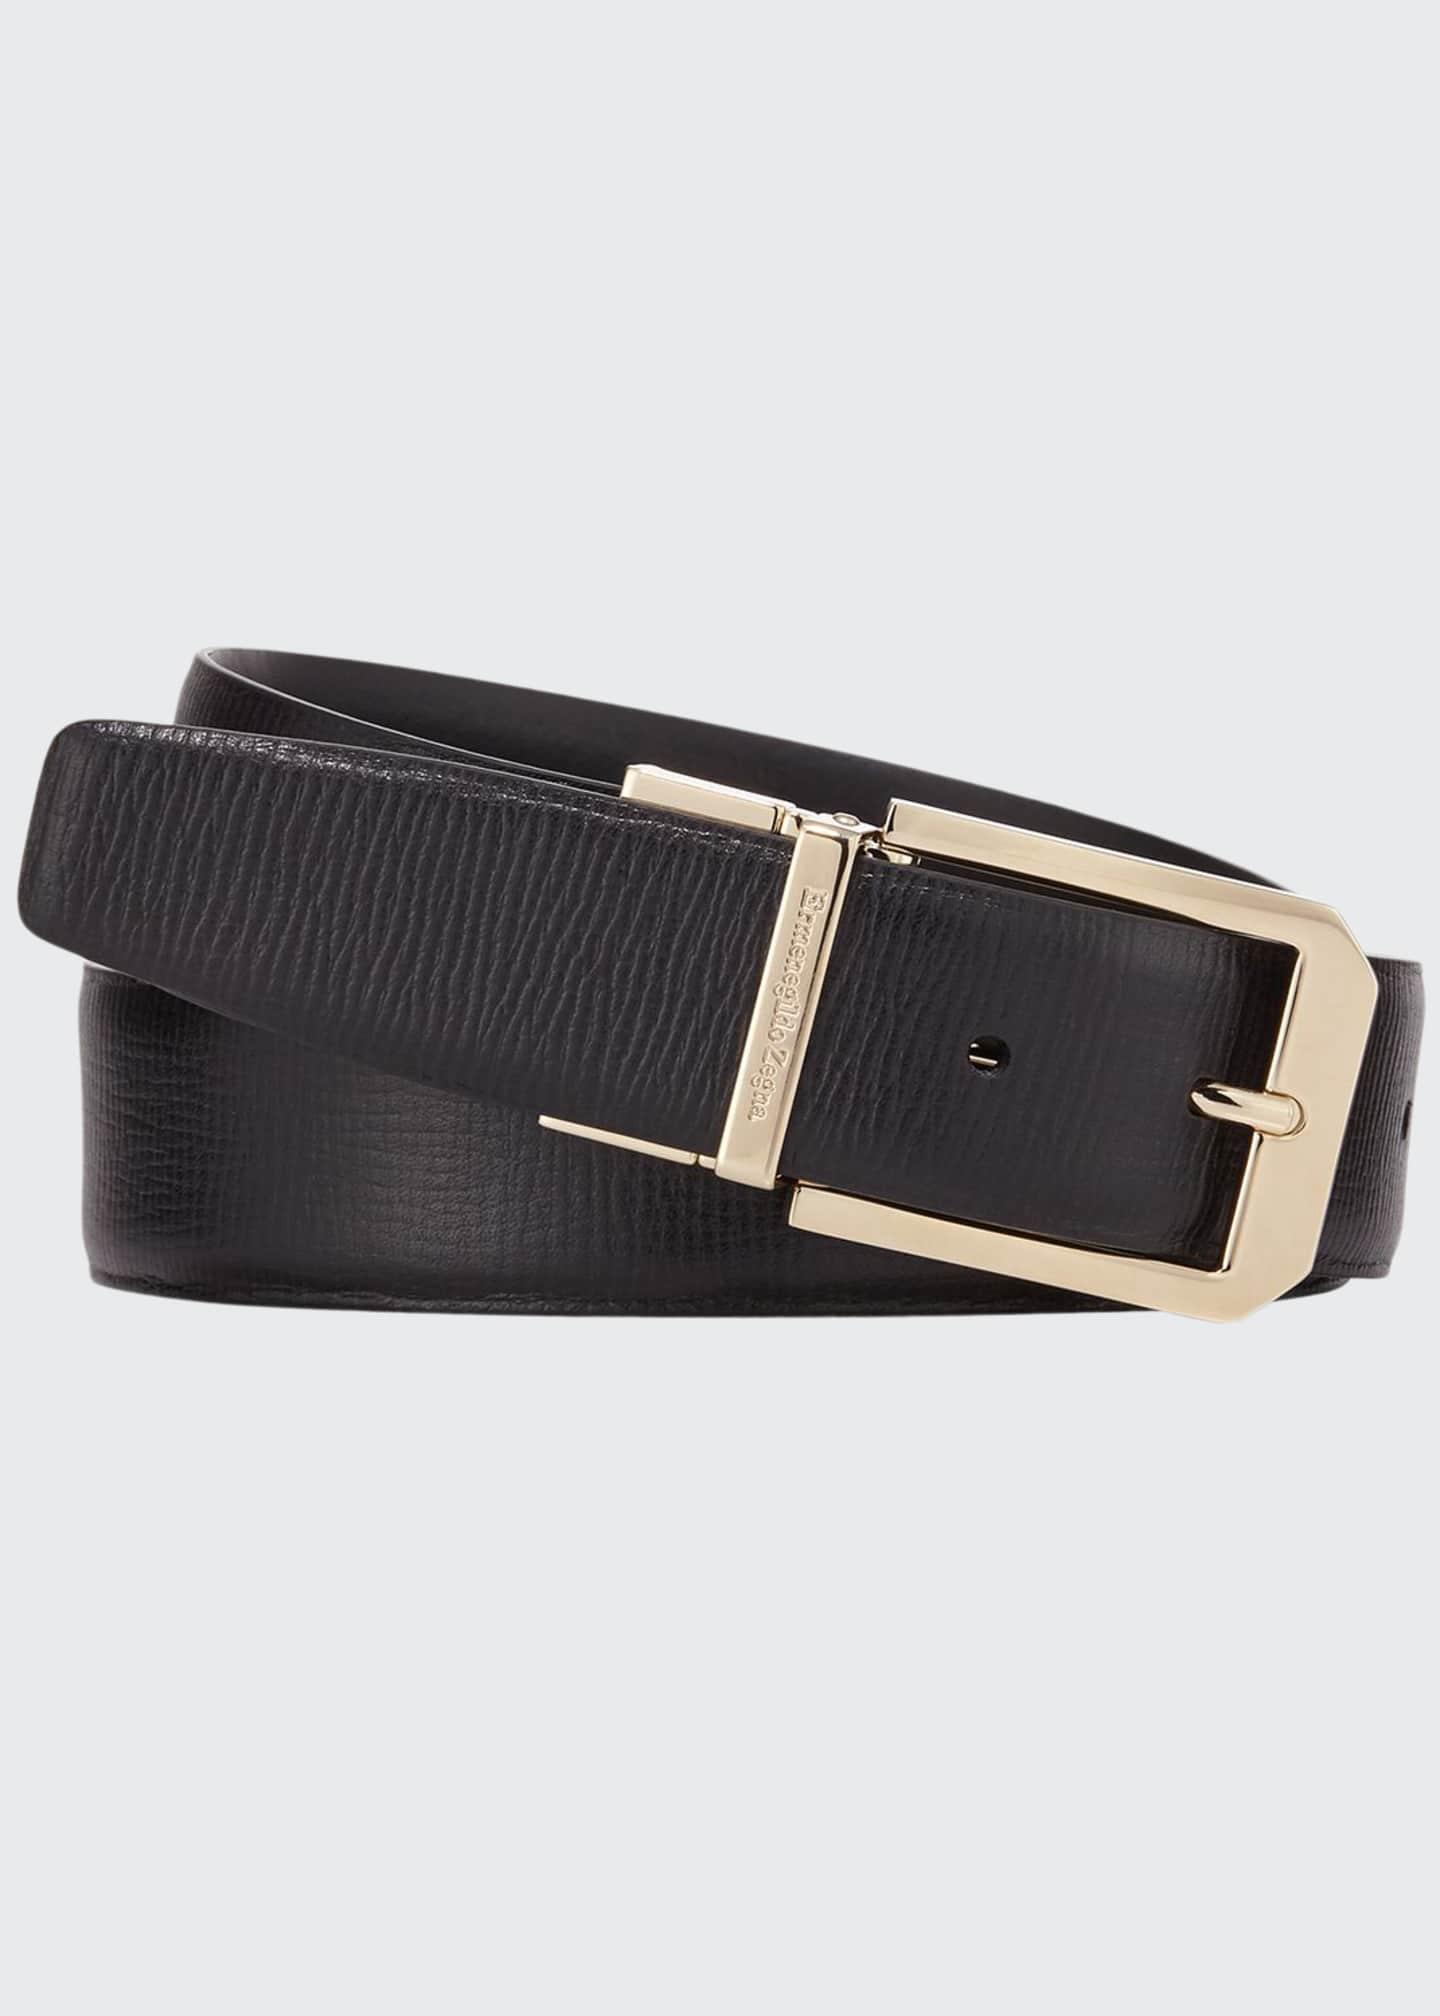 Ermenegildo Zegna Men's Reversible 35mm Square-Buckle Leather